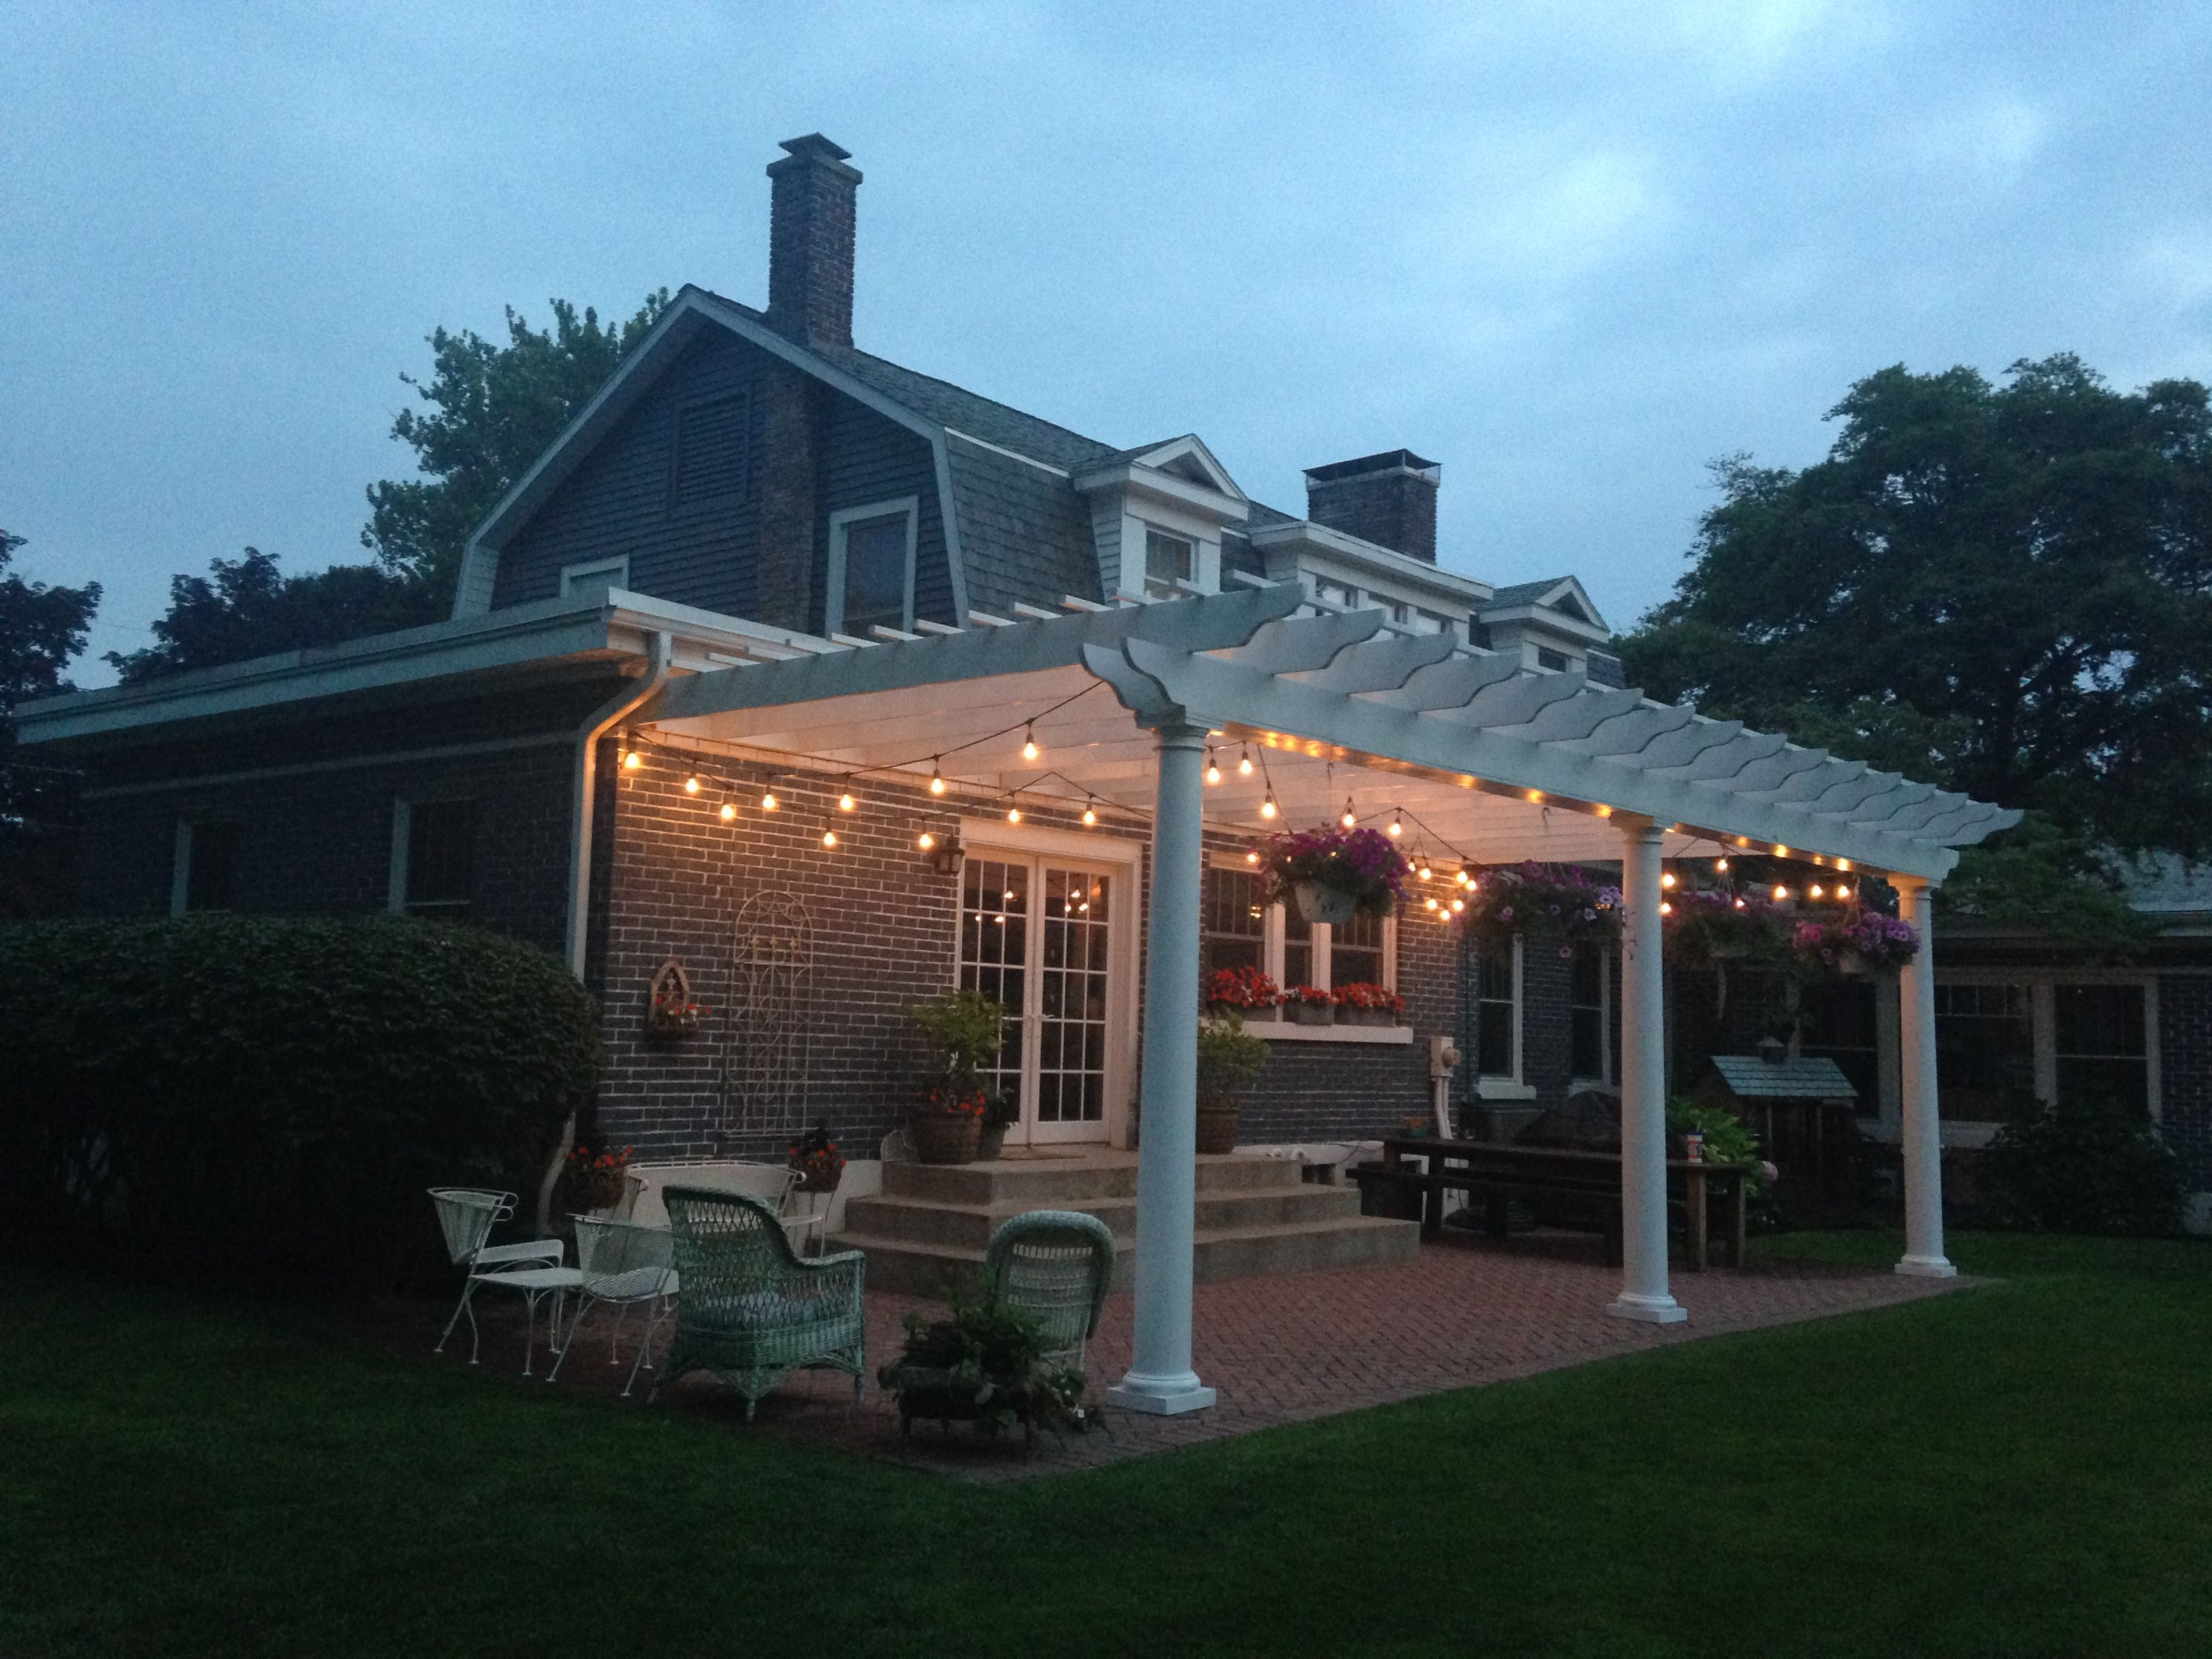 Finished   Pergola, Herringbone Brick Patio, Cafe Lights, Reclaimed Barn  Wood Table